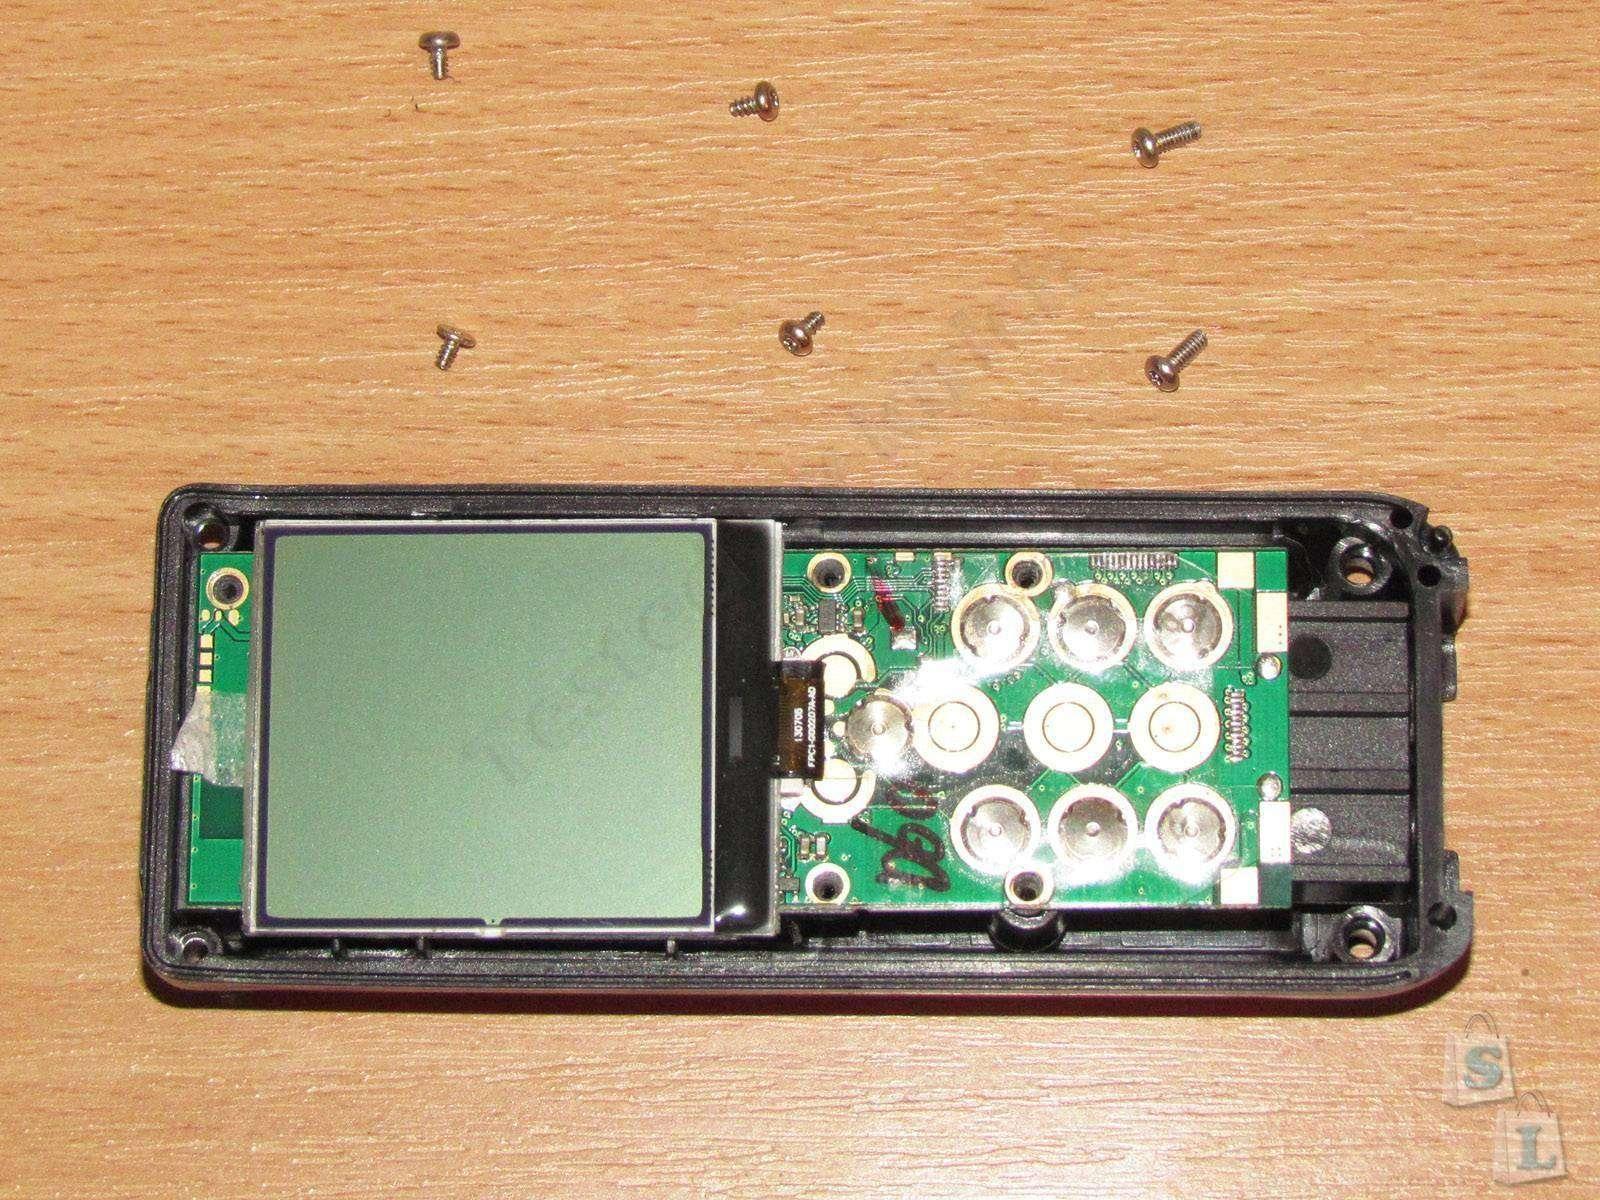 EachBuyer: RZD-60 Лазерный дальномер на 60 метров, мал да удал.